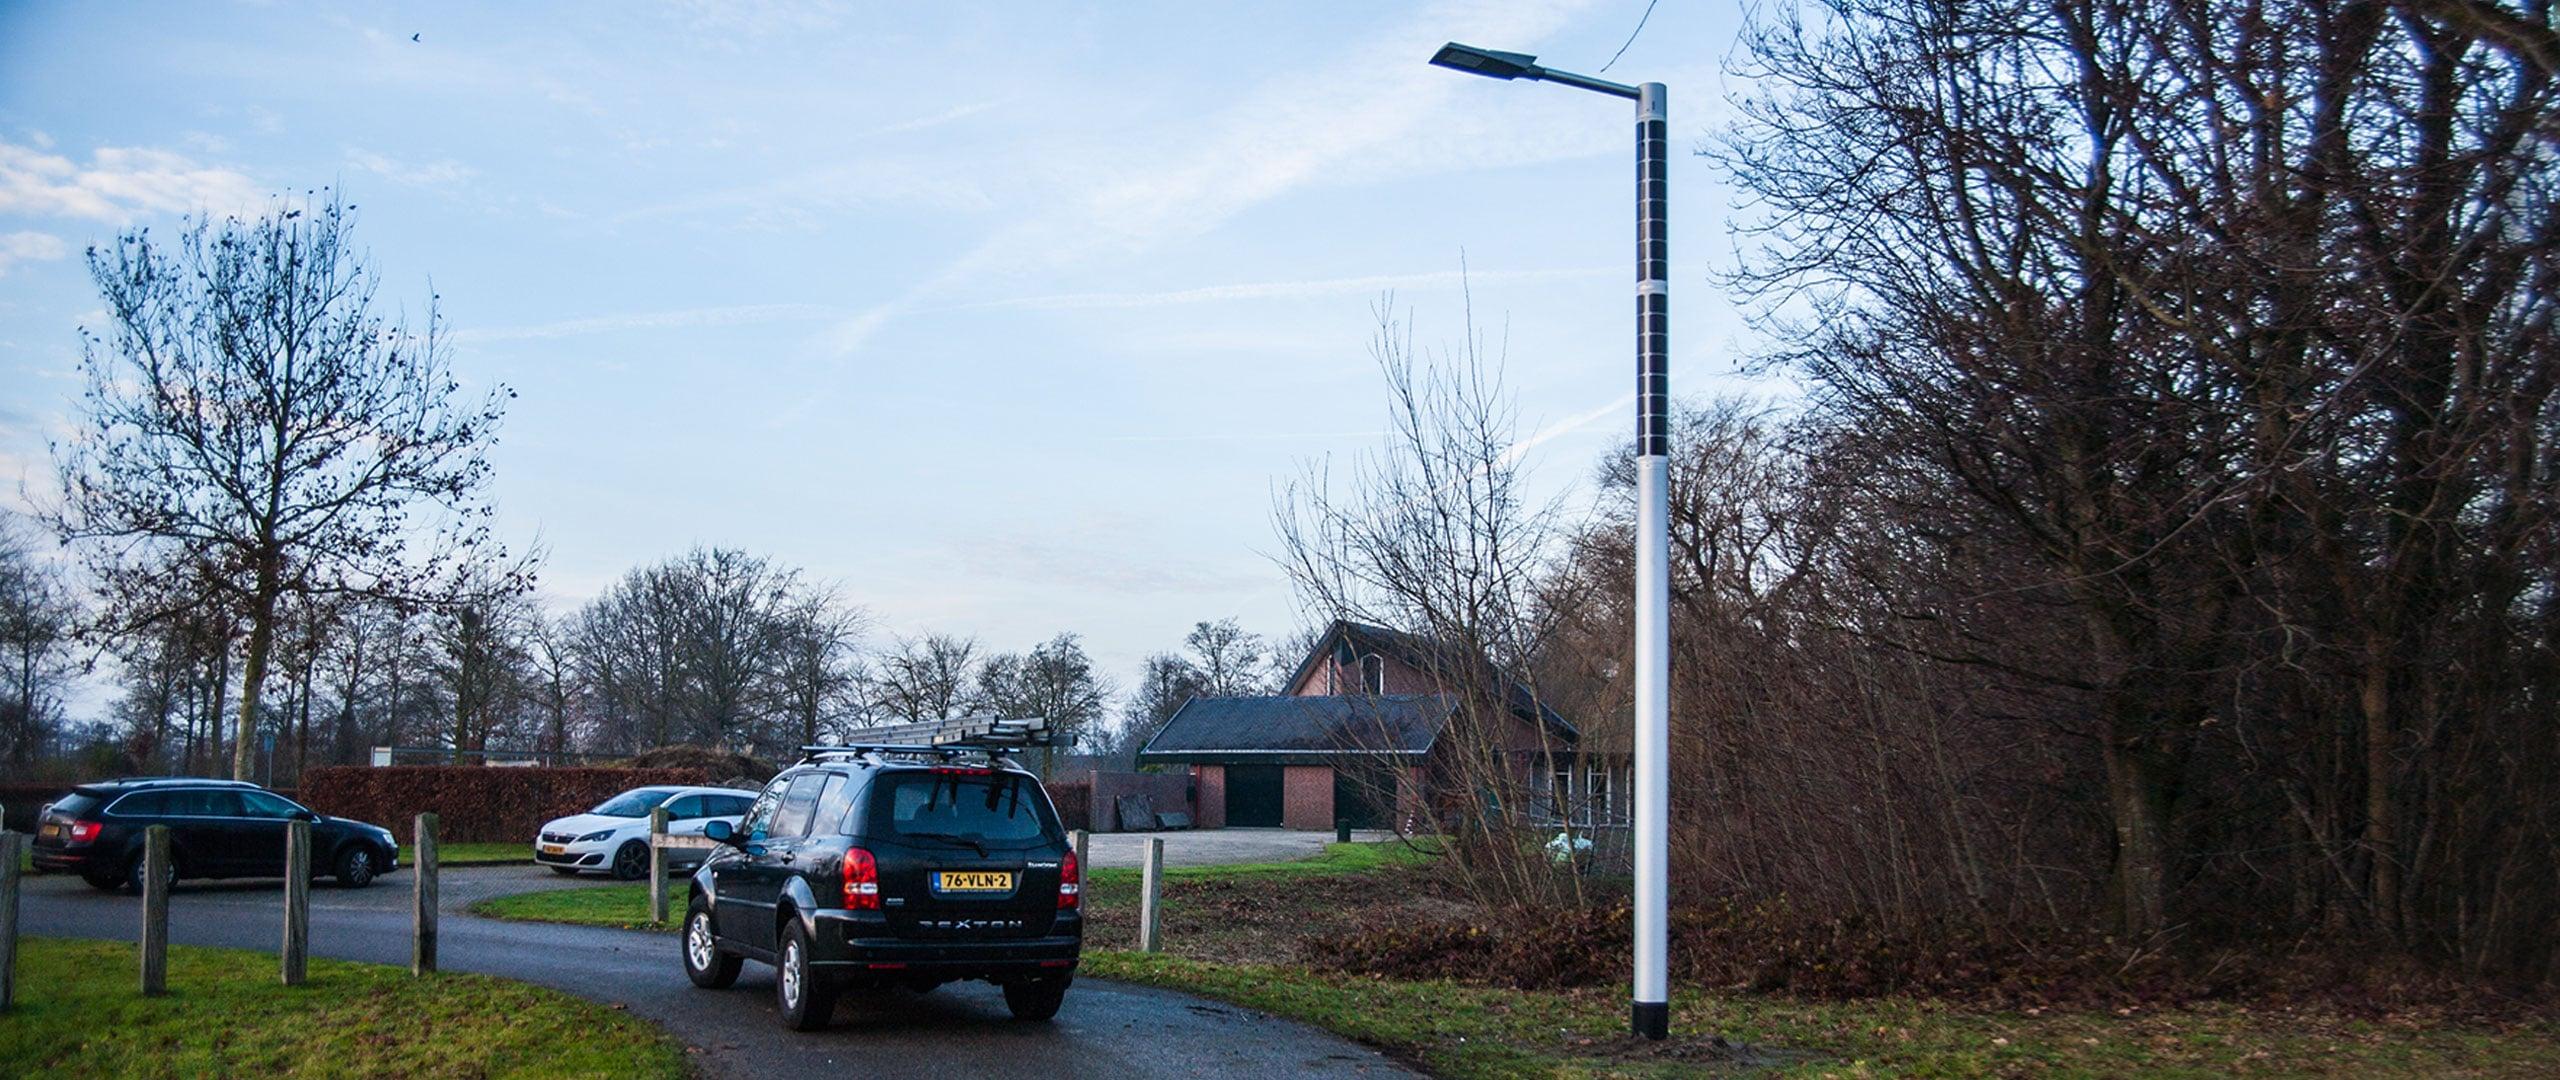 Poste de luz solar -Soluxio Grid alumbrado publico solar carretera